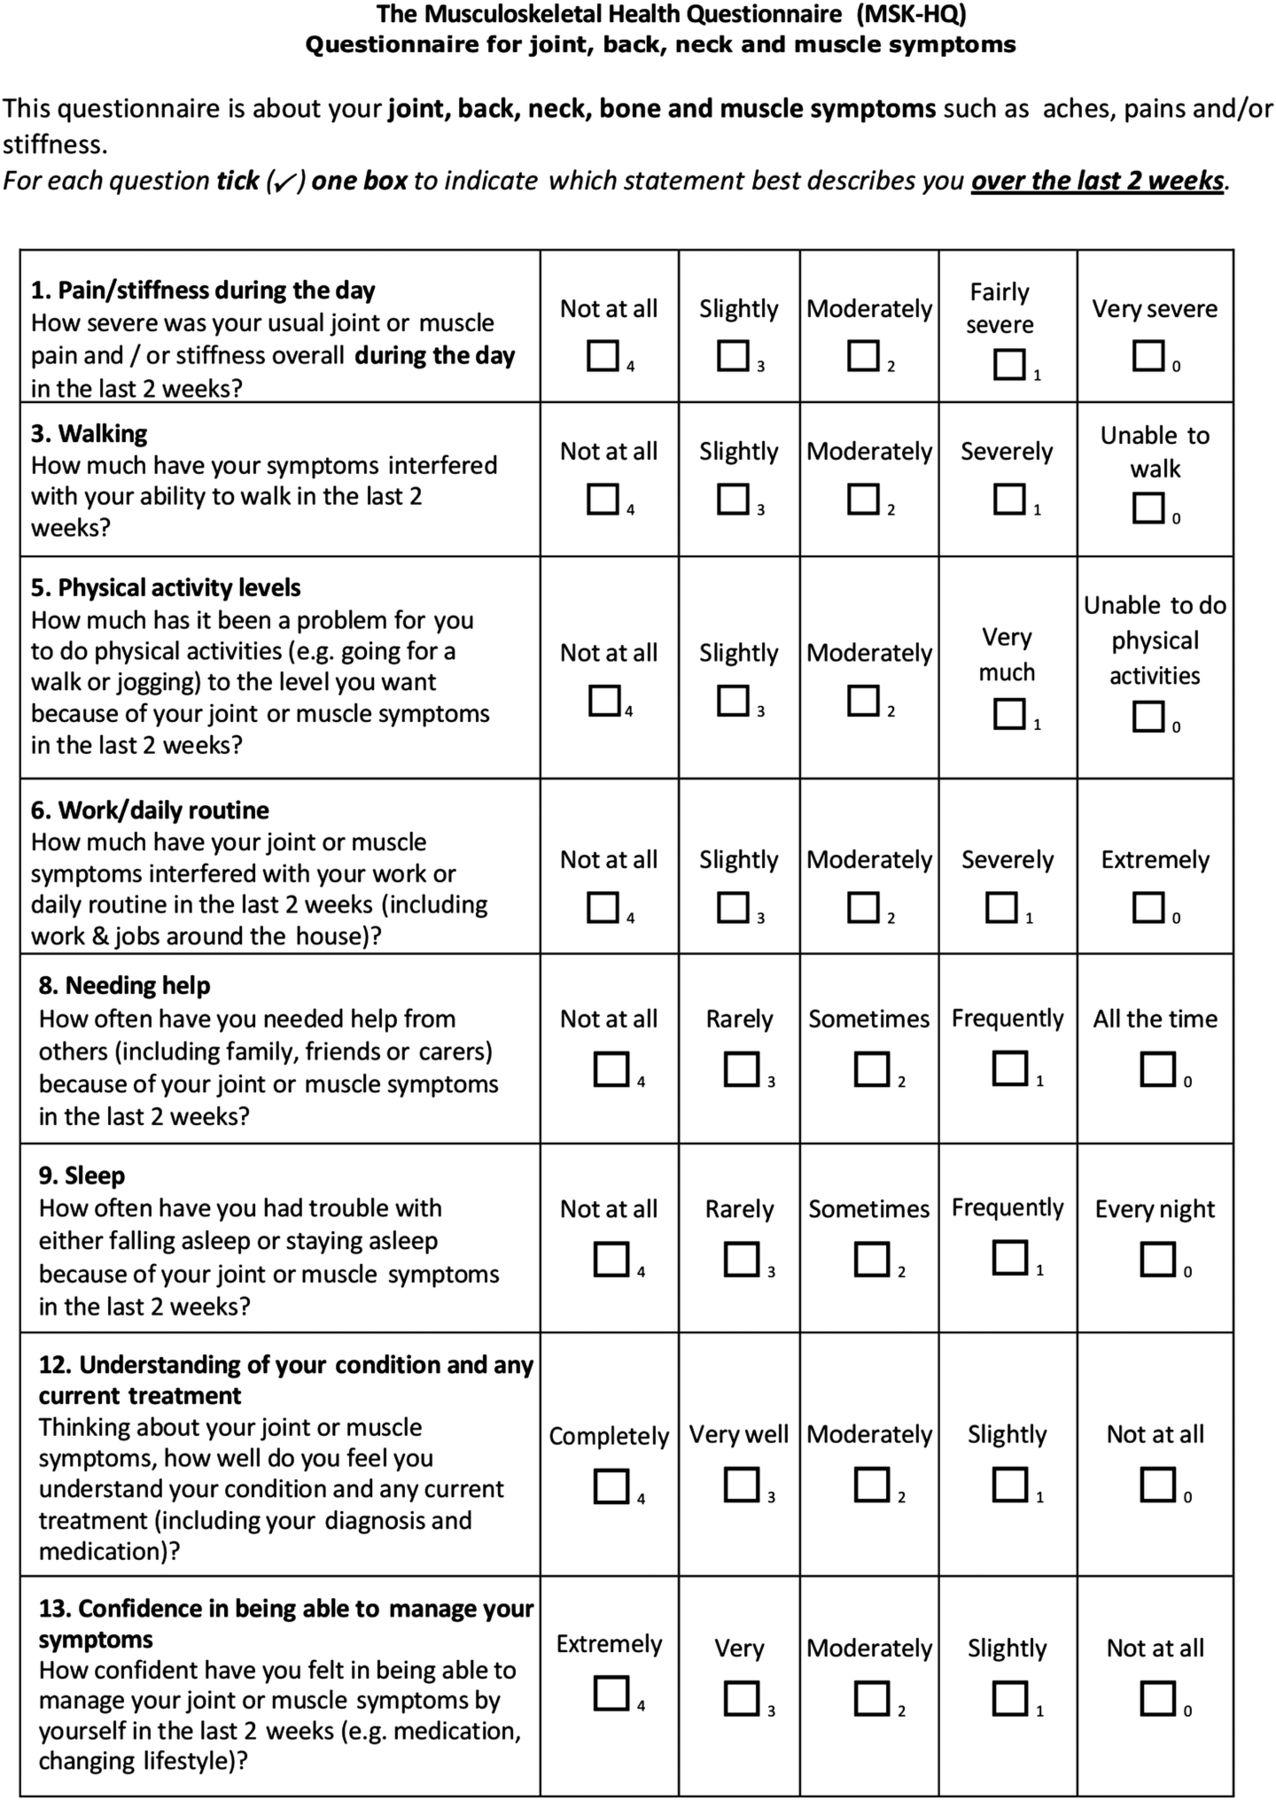 understanding options pdf free download